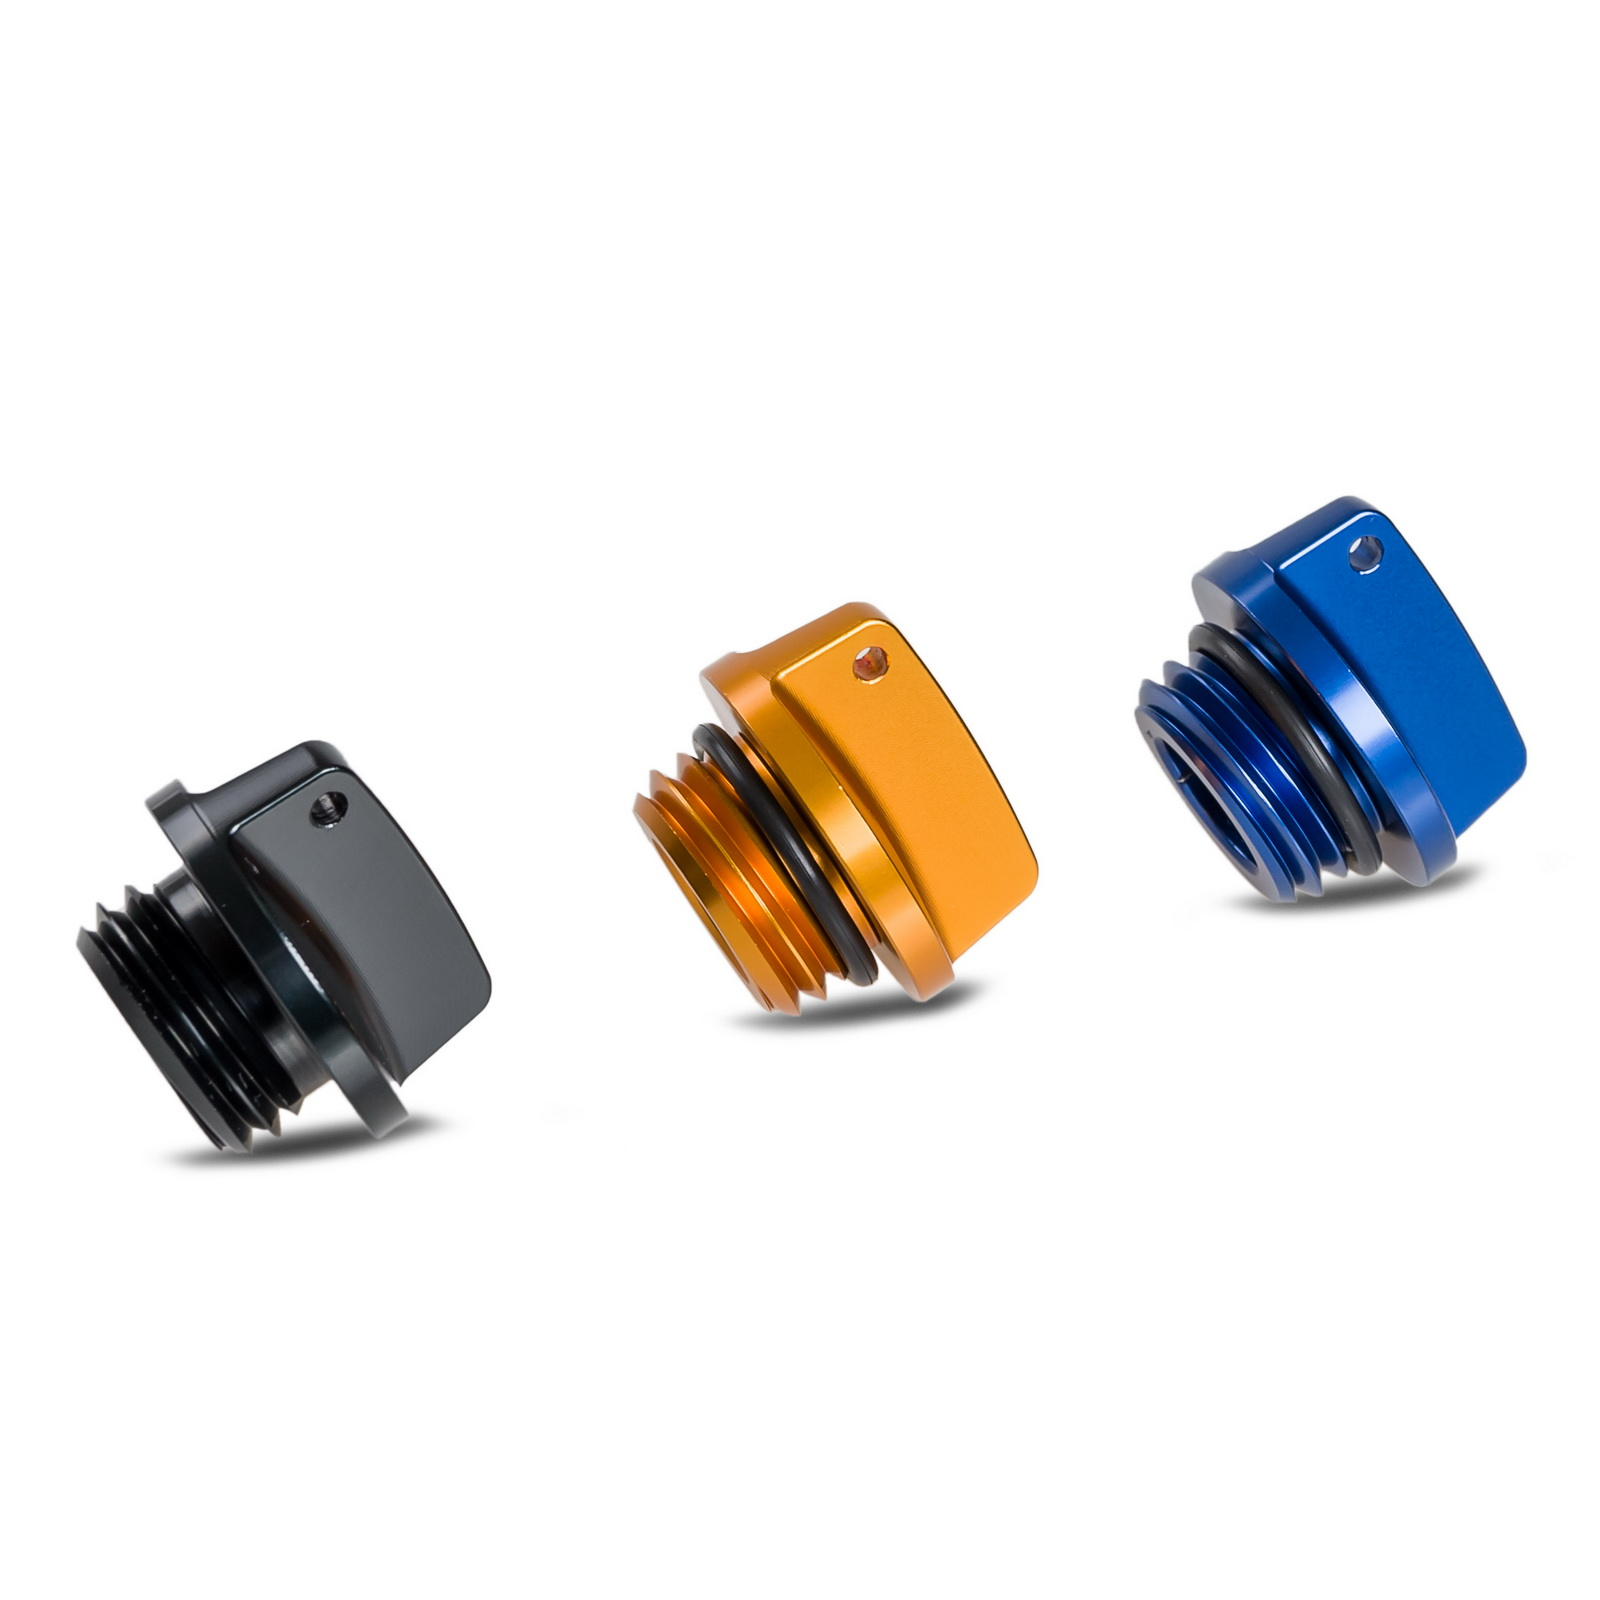 NICECNC Motos Huile Bouchon Plug Pour Yamaha R1 R3 R6 FZ1 FZ6/R FZ07 FZ8 FJR1300 MT01 MT07 YFM600 FZR FZS TDM XVS650 TZ250